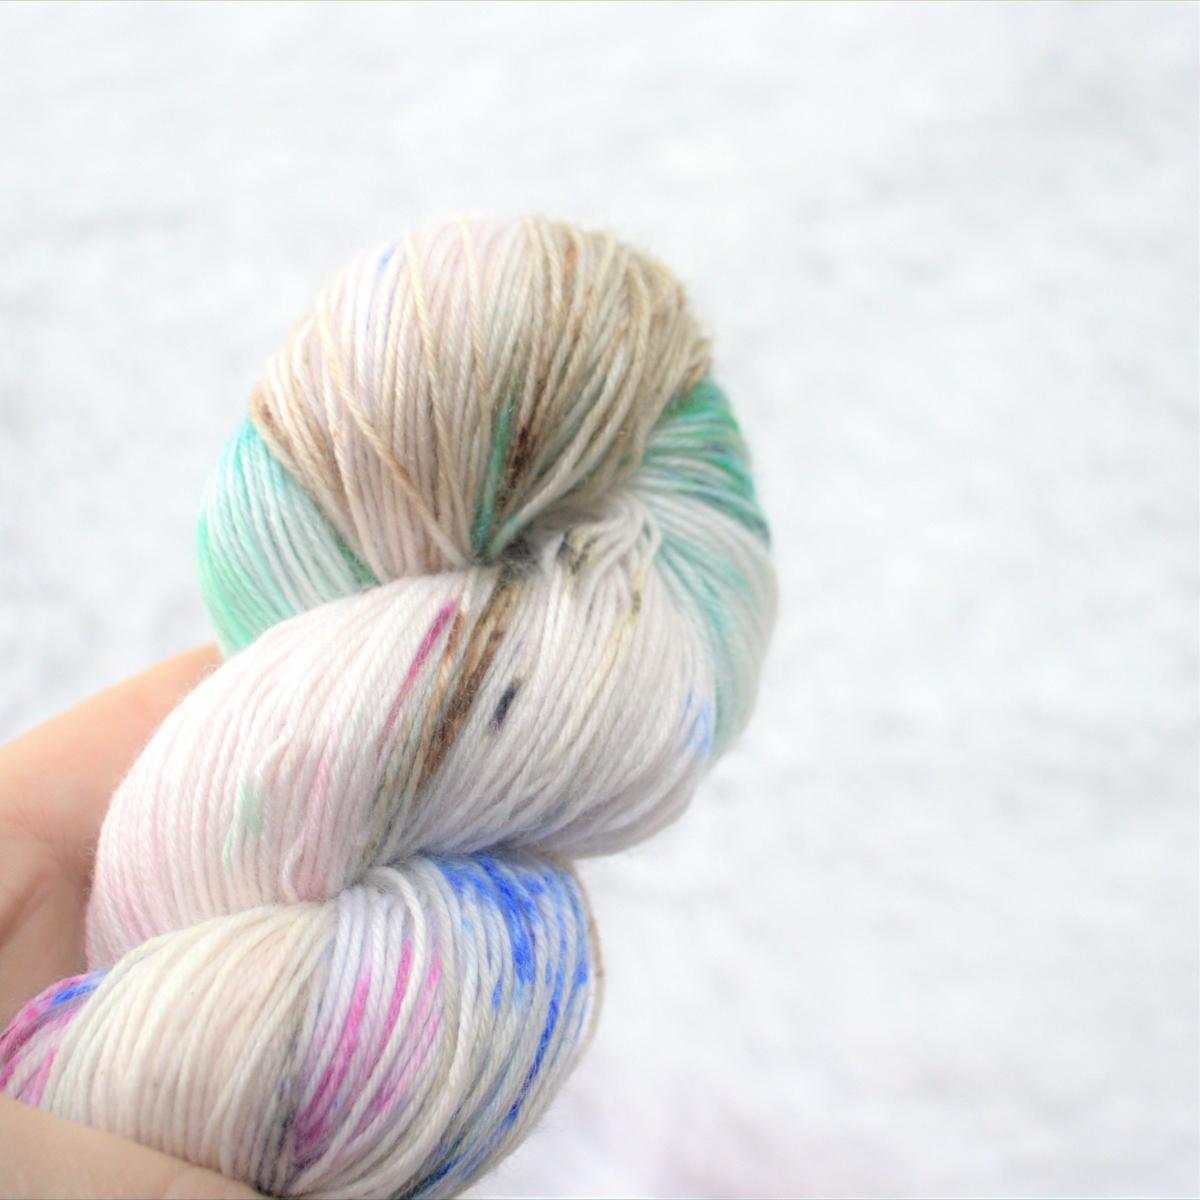 woodico.pro hand dyed yarn 048 1 1200x1200 - Hand dyed yarn / 048